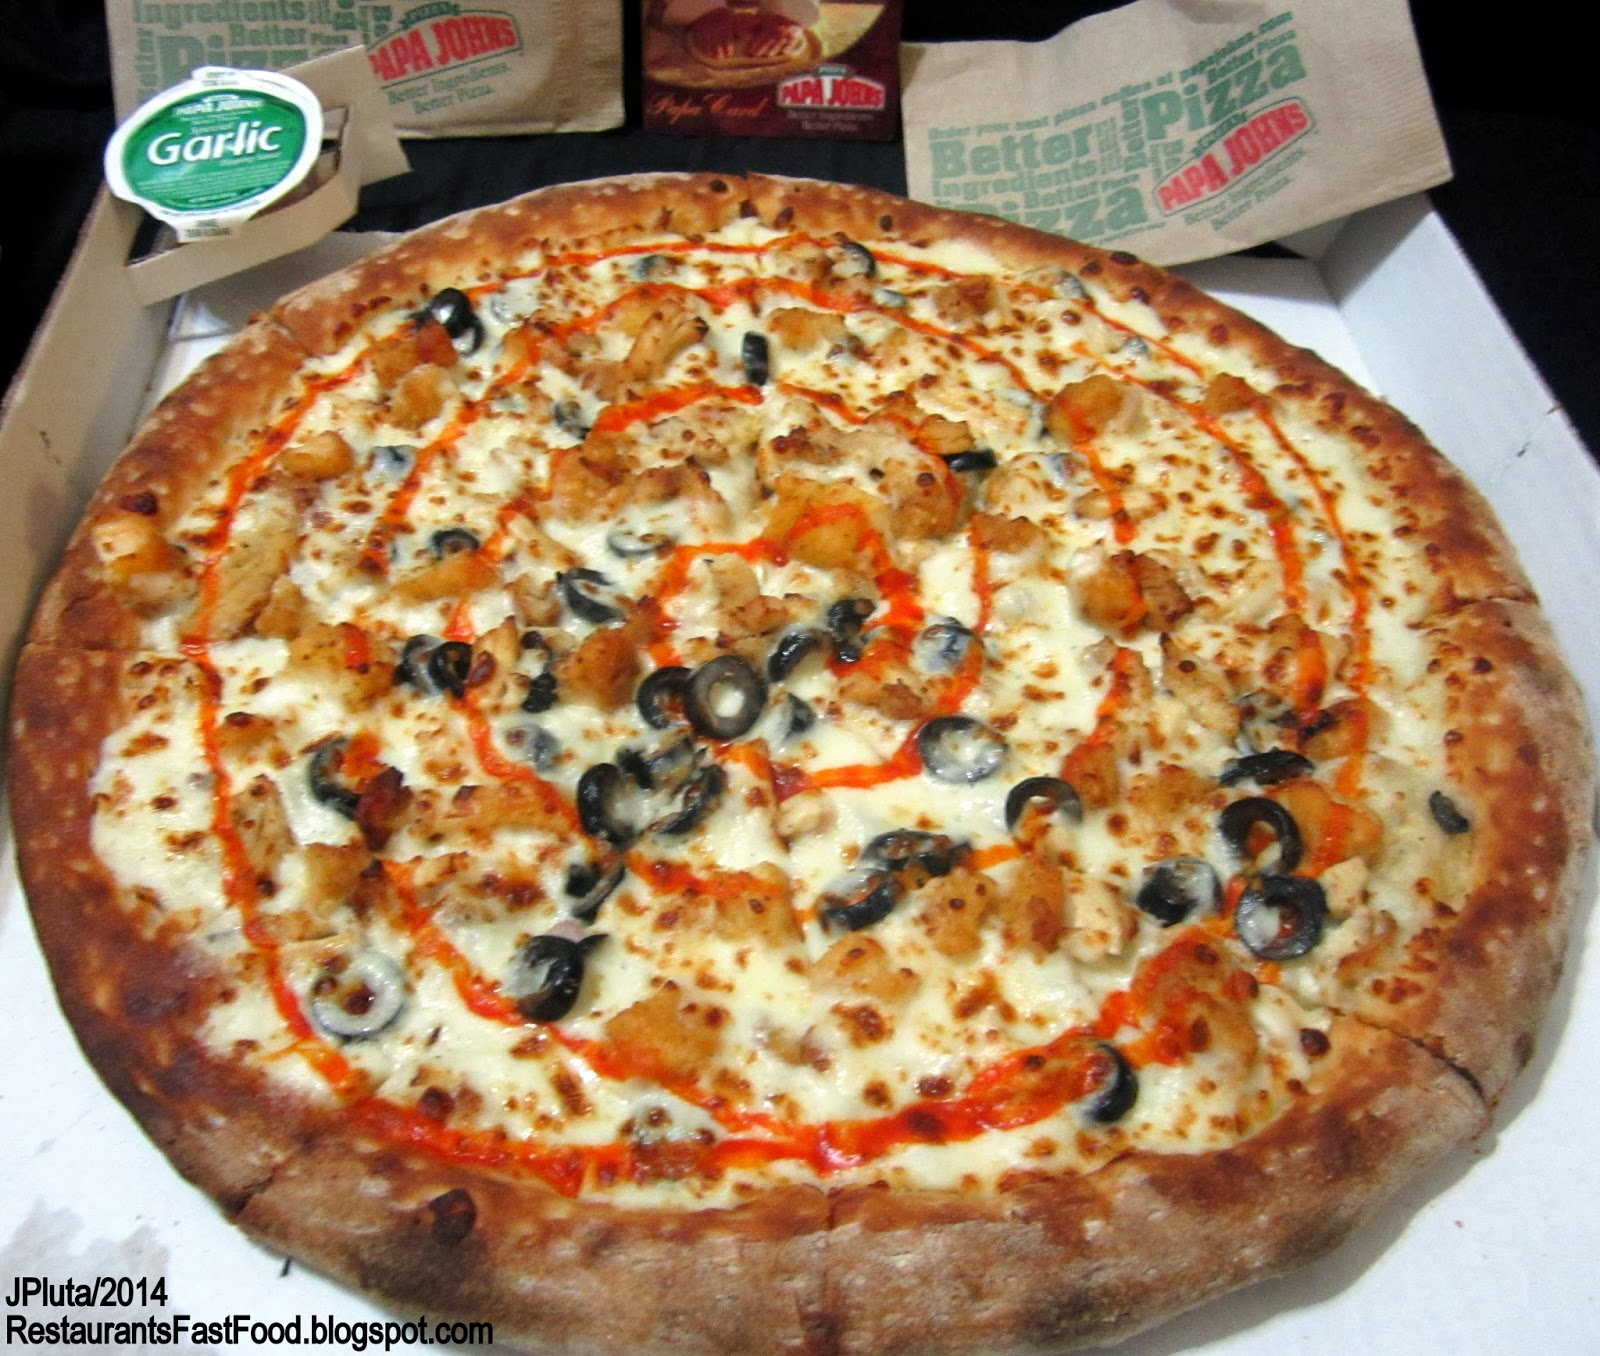 Warner robins georgia air force base houston restaurant for Pizza original